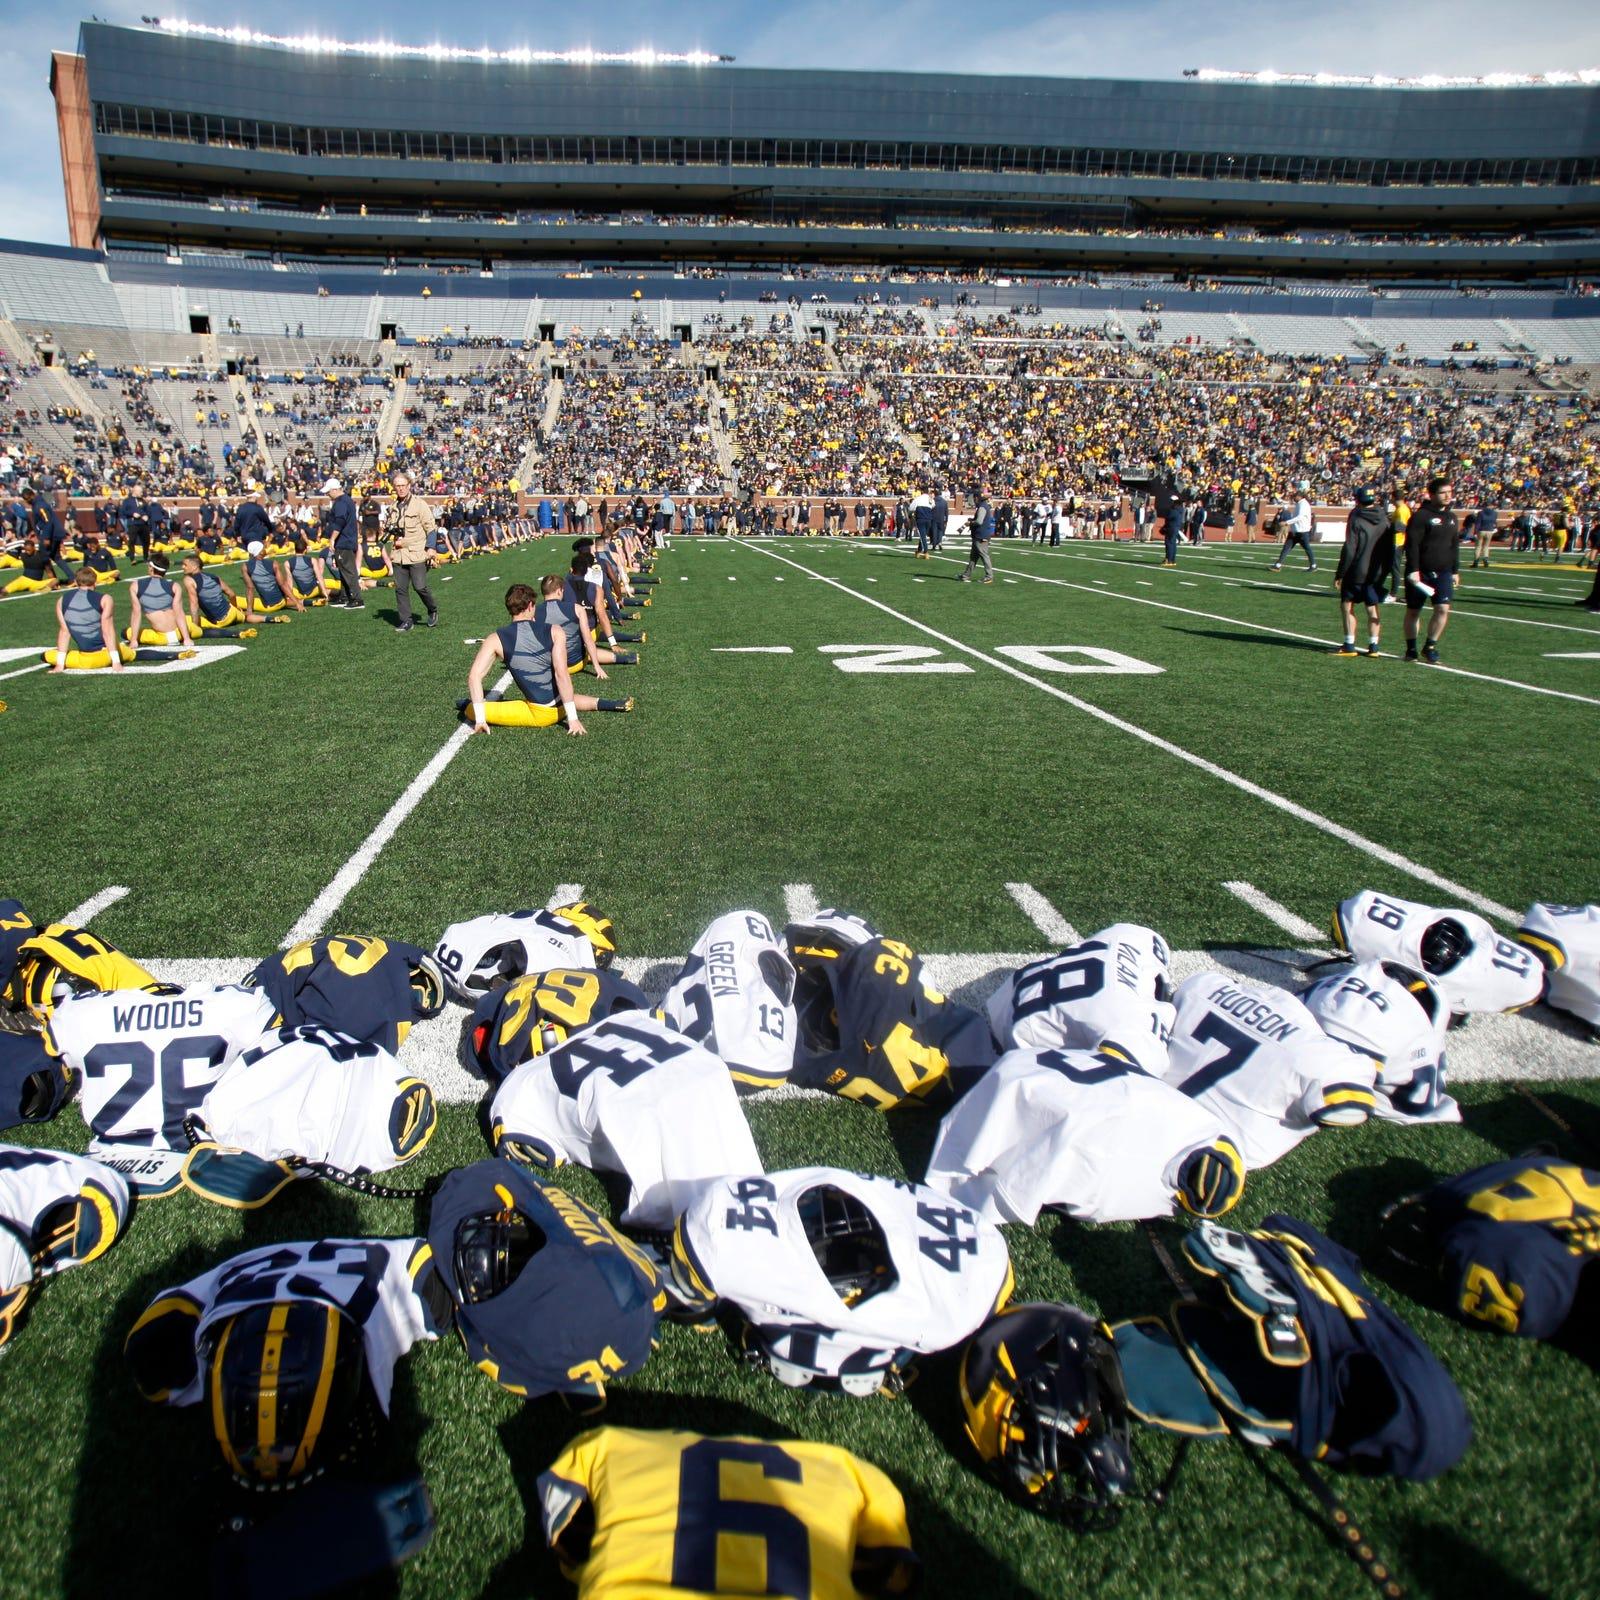 Michigan football recruiting: 2020 receiver Kalil Branham decommits